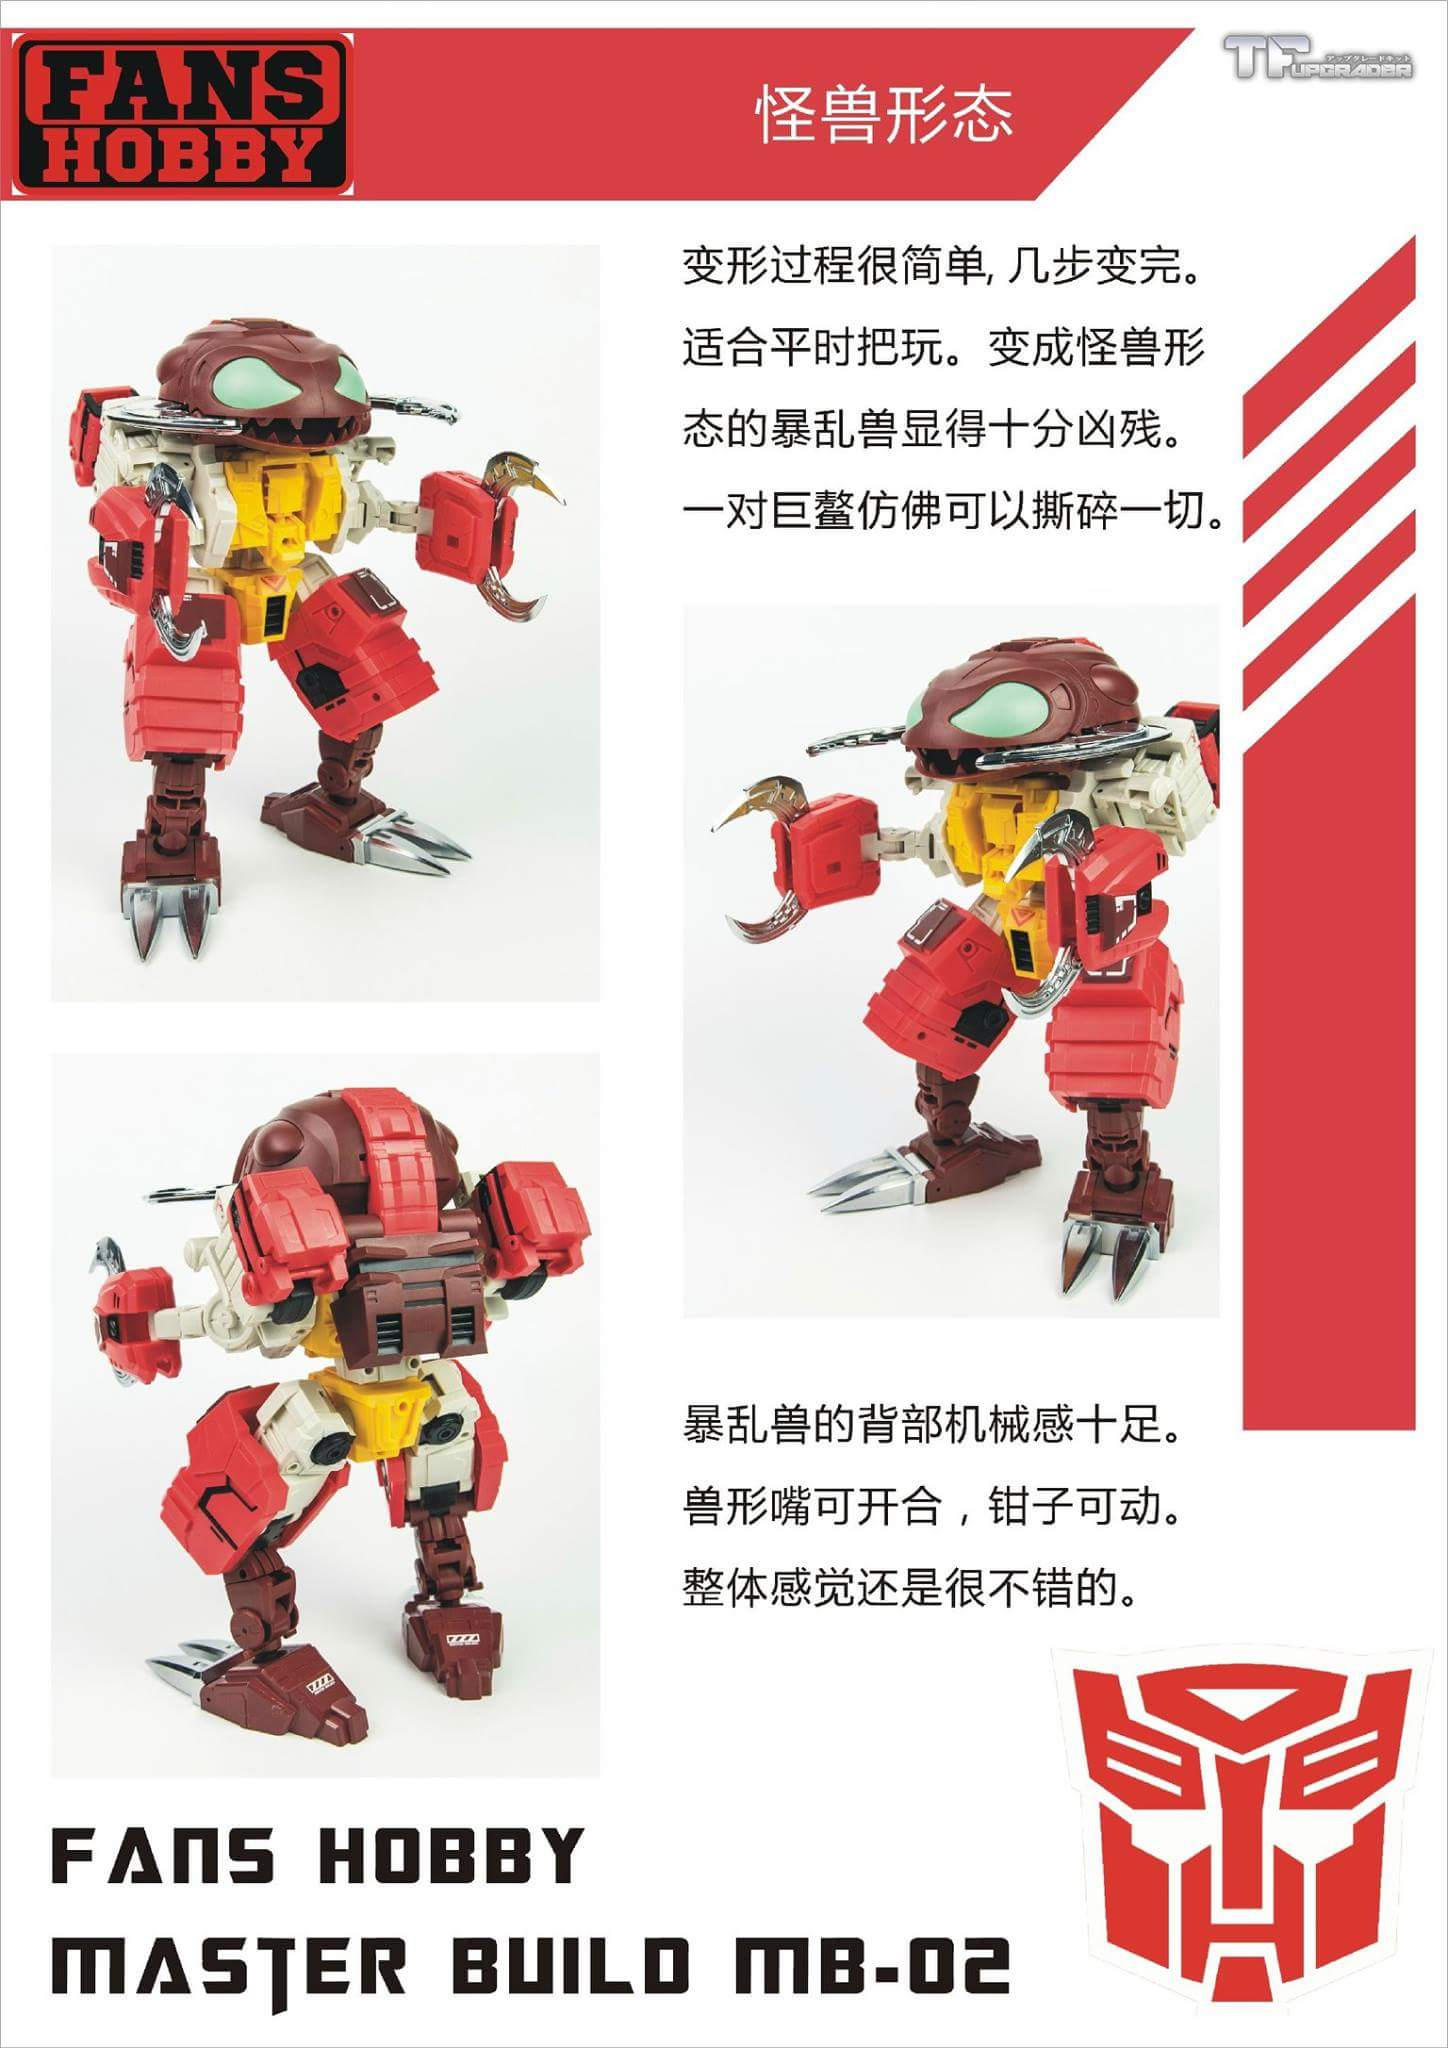 [FansHobby] Produit Tiers - Master Builder MB-02/03/05 - aka Monsterbots/Monstrebots AQoovntf